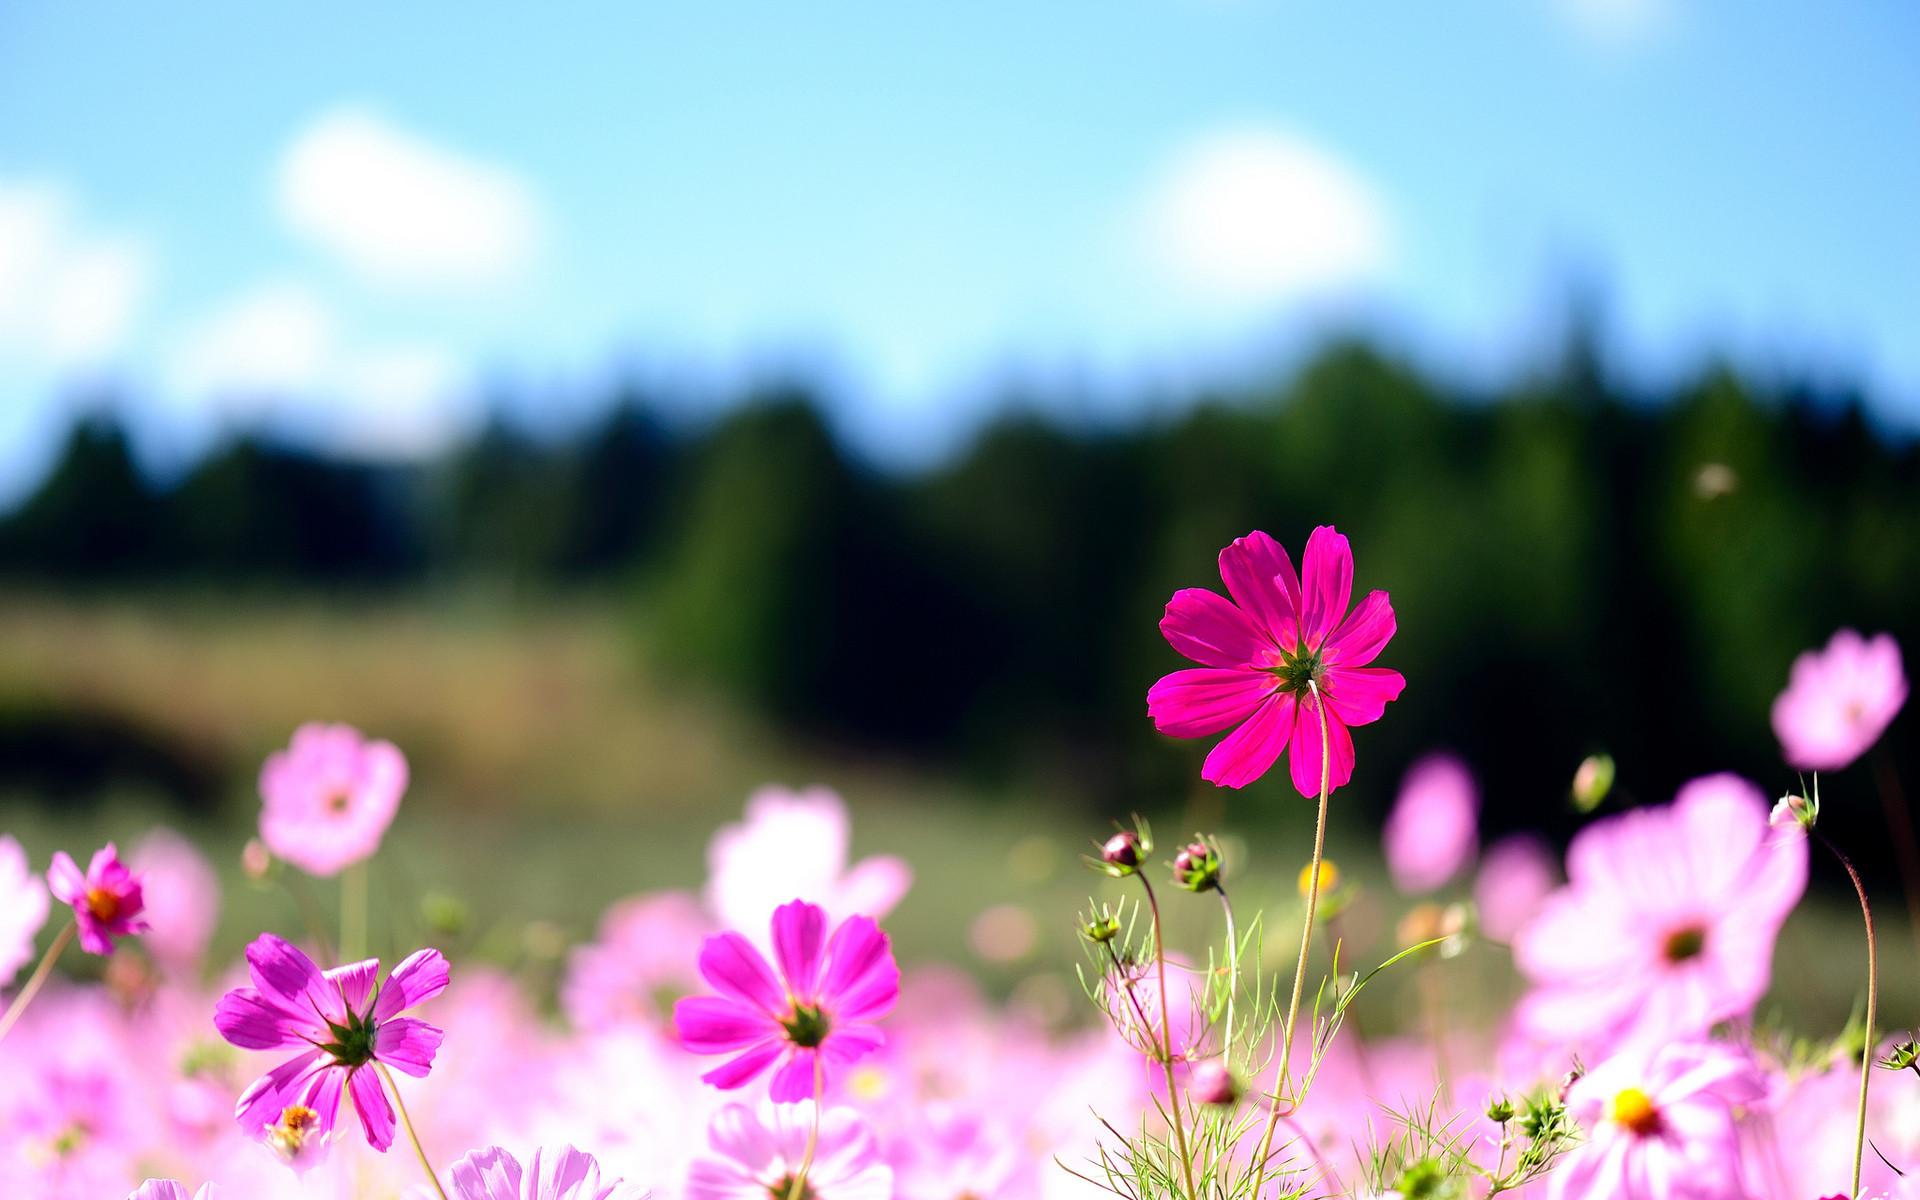 Cool Flowers Desktop Backgrounds: Pink Flowers High Definition .